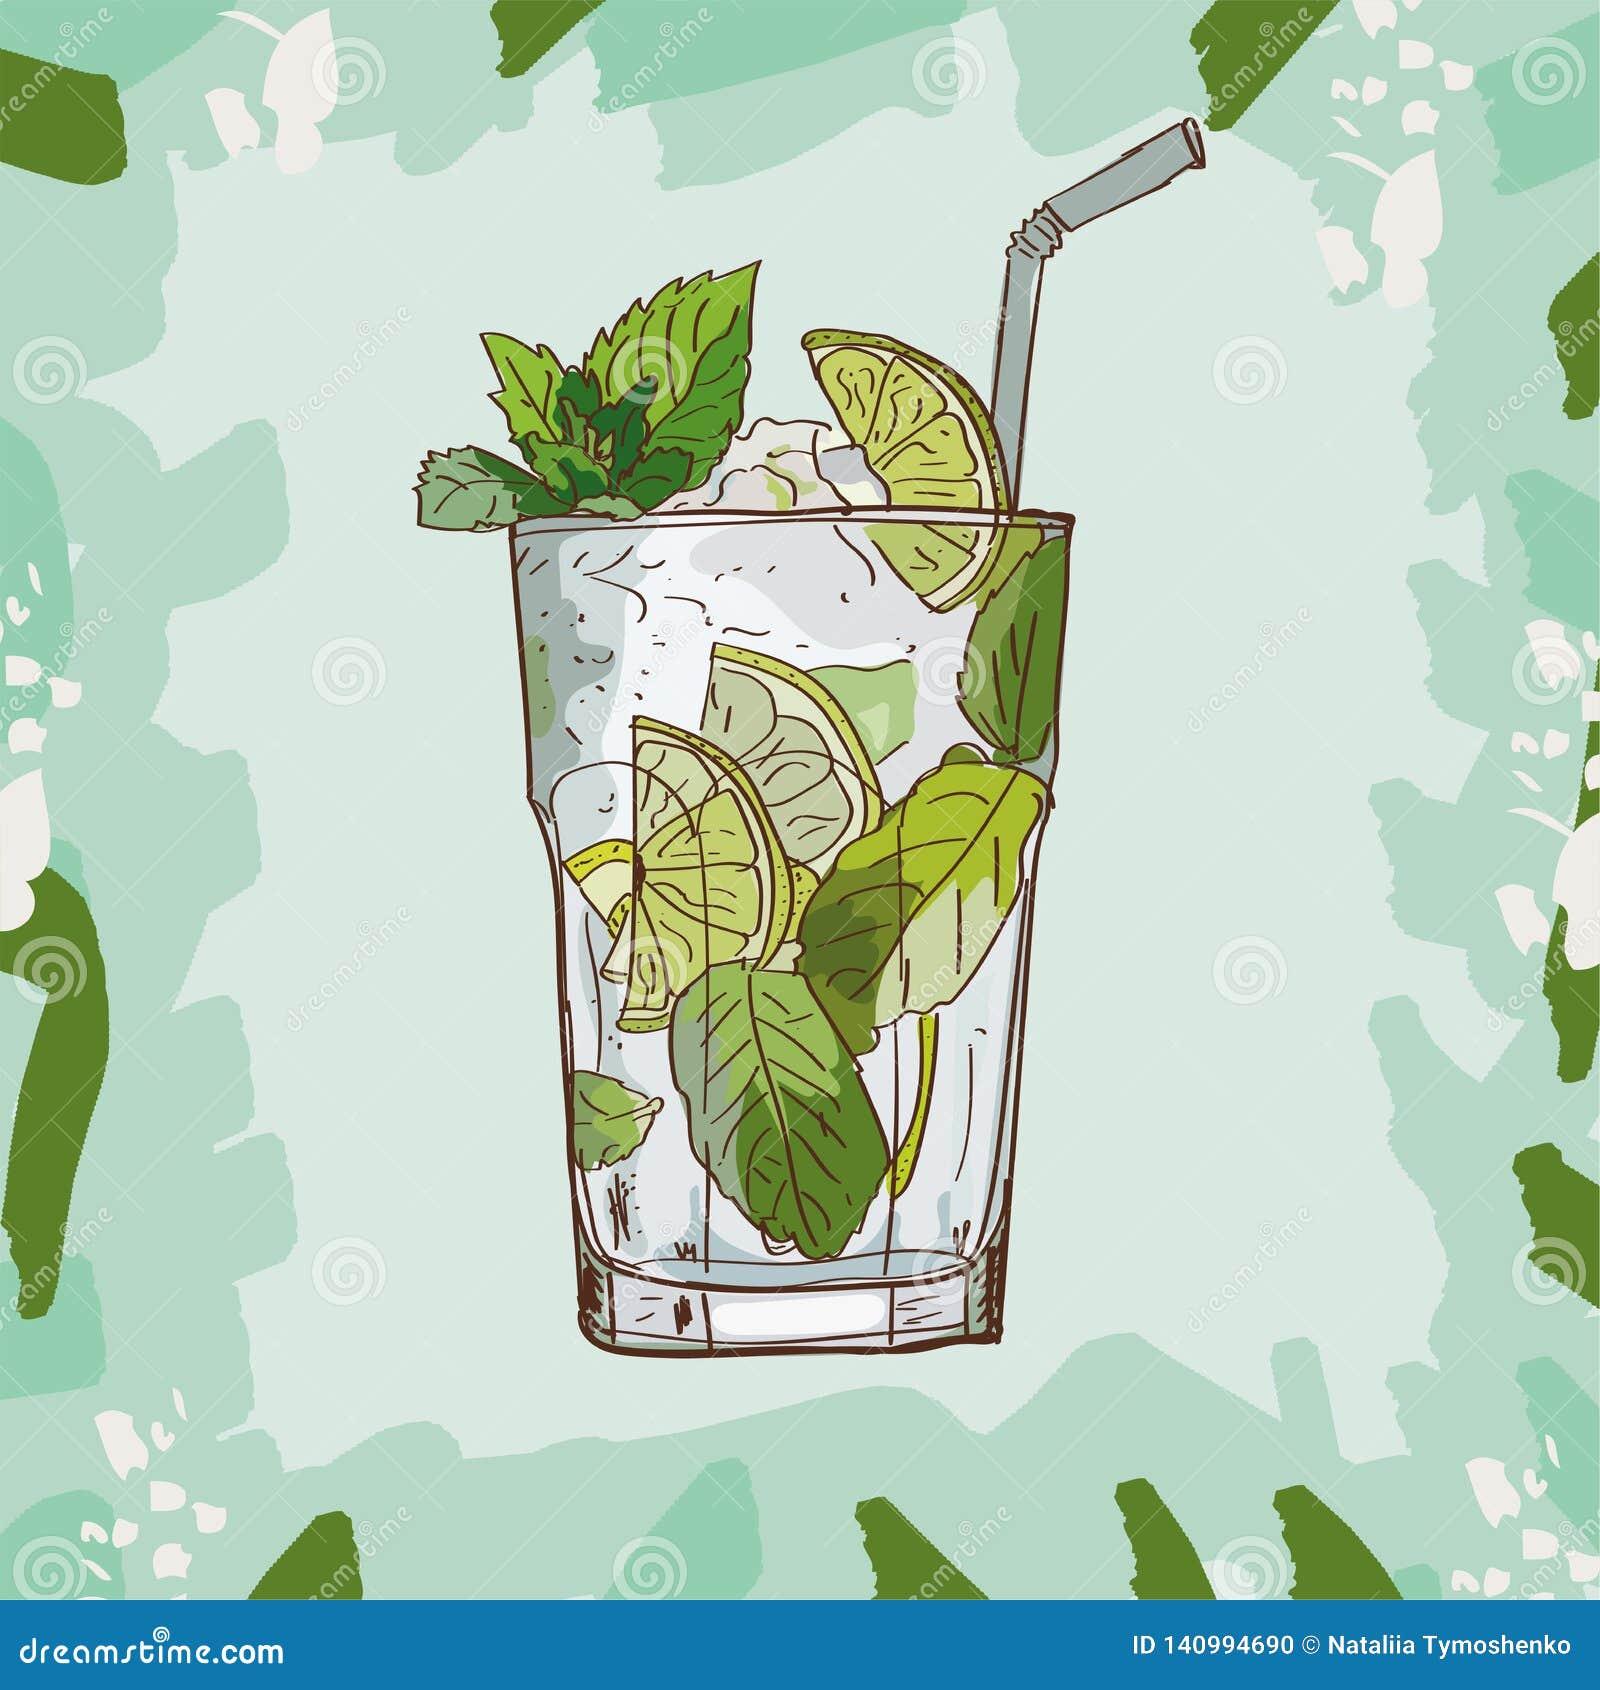 Mojito fresh Contemporary classic cocktail illustration. Alcoholic bar drink hand drawn vector. Pop art